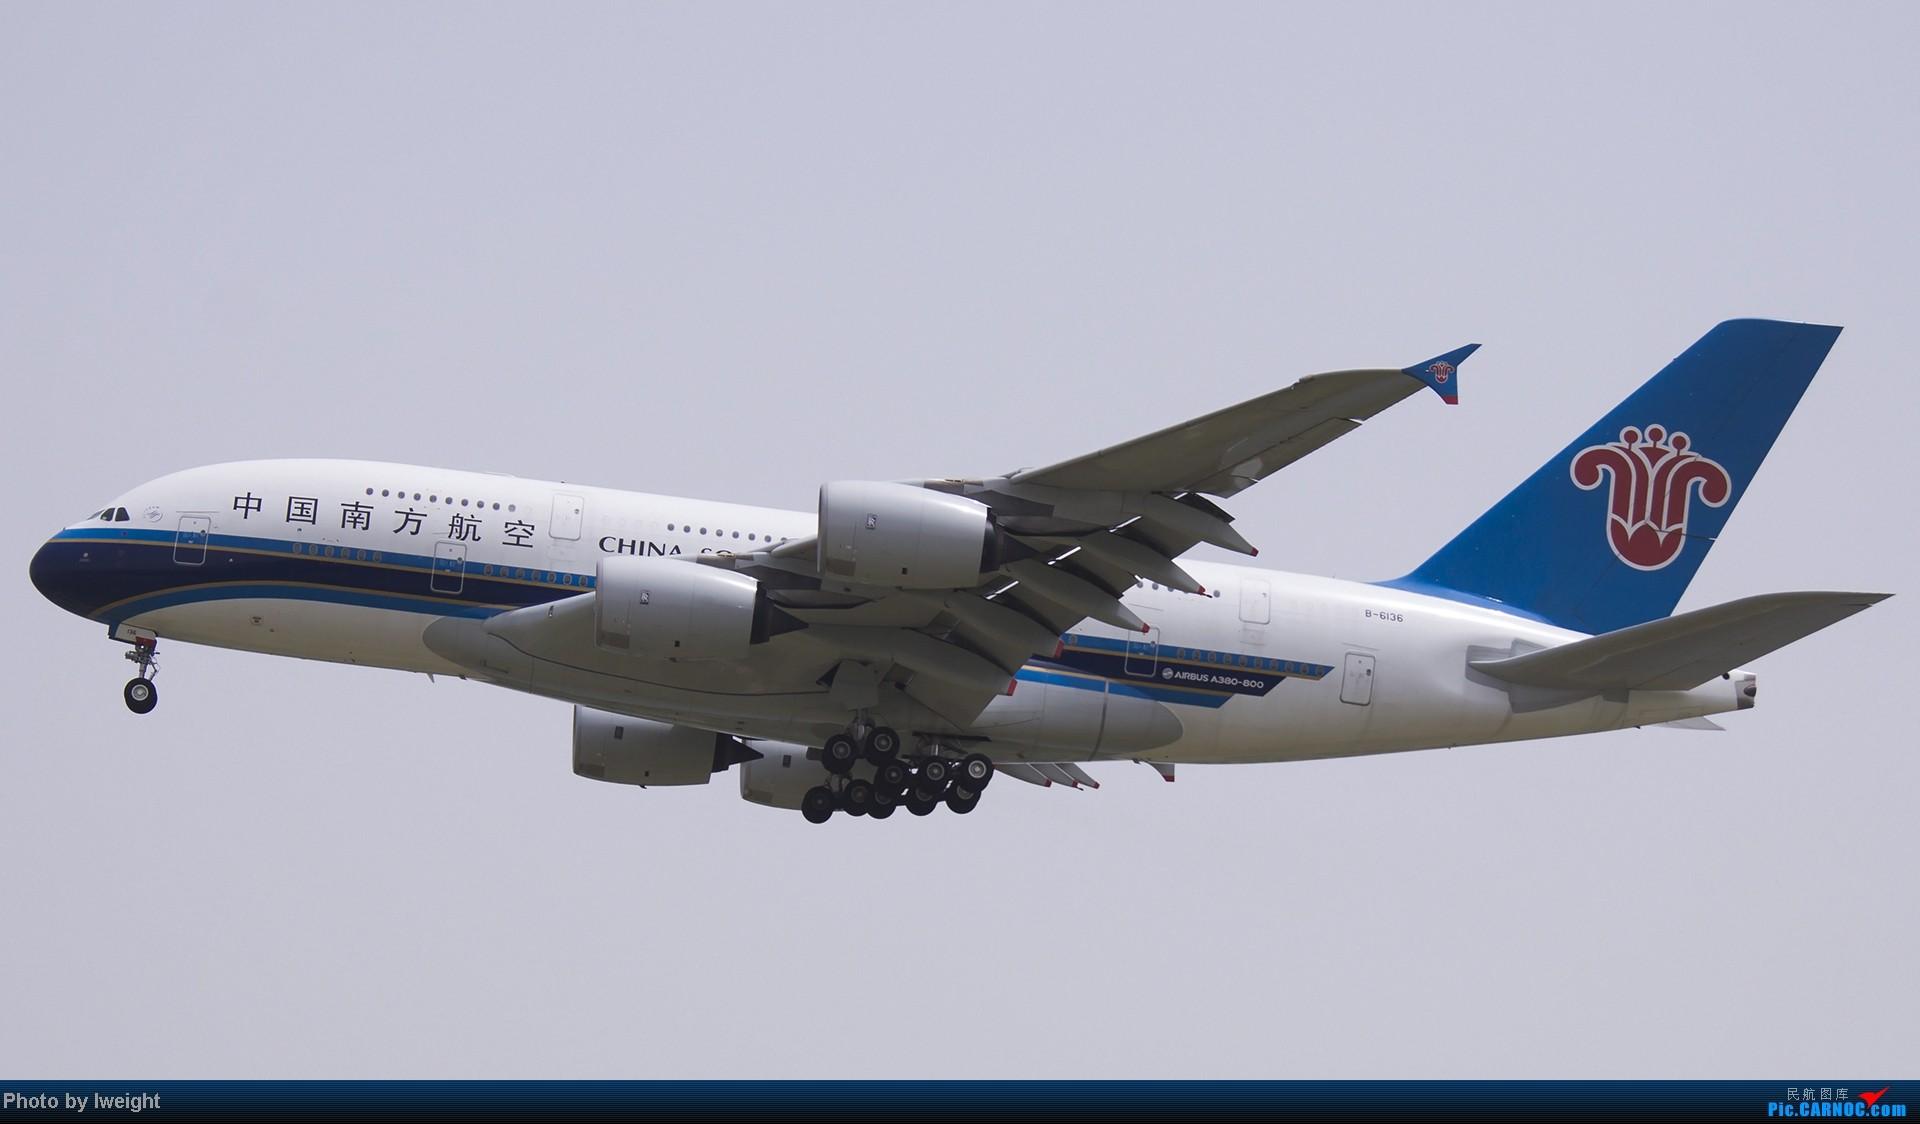 Re:[原创]霾天首都机场随拍 AIRBUS A380 B-6136 中国北京首都机场